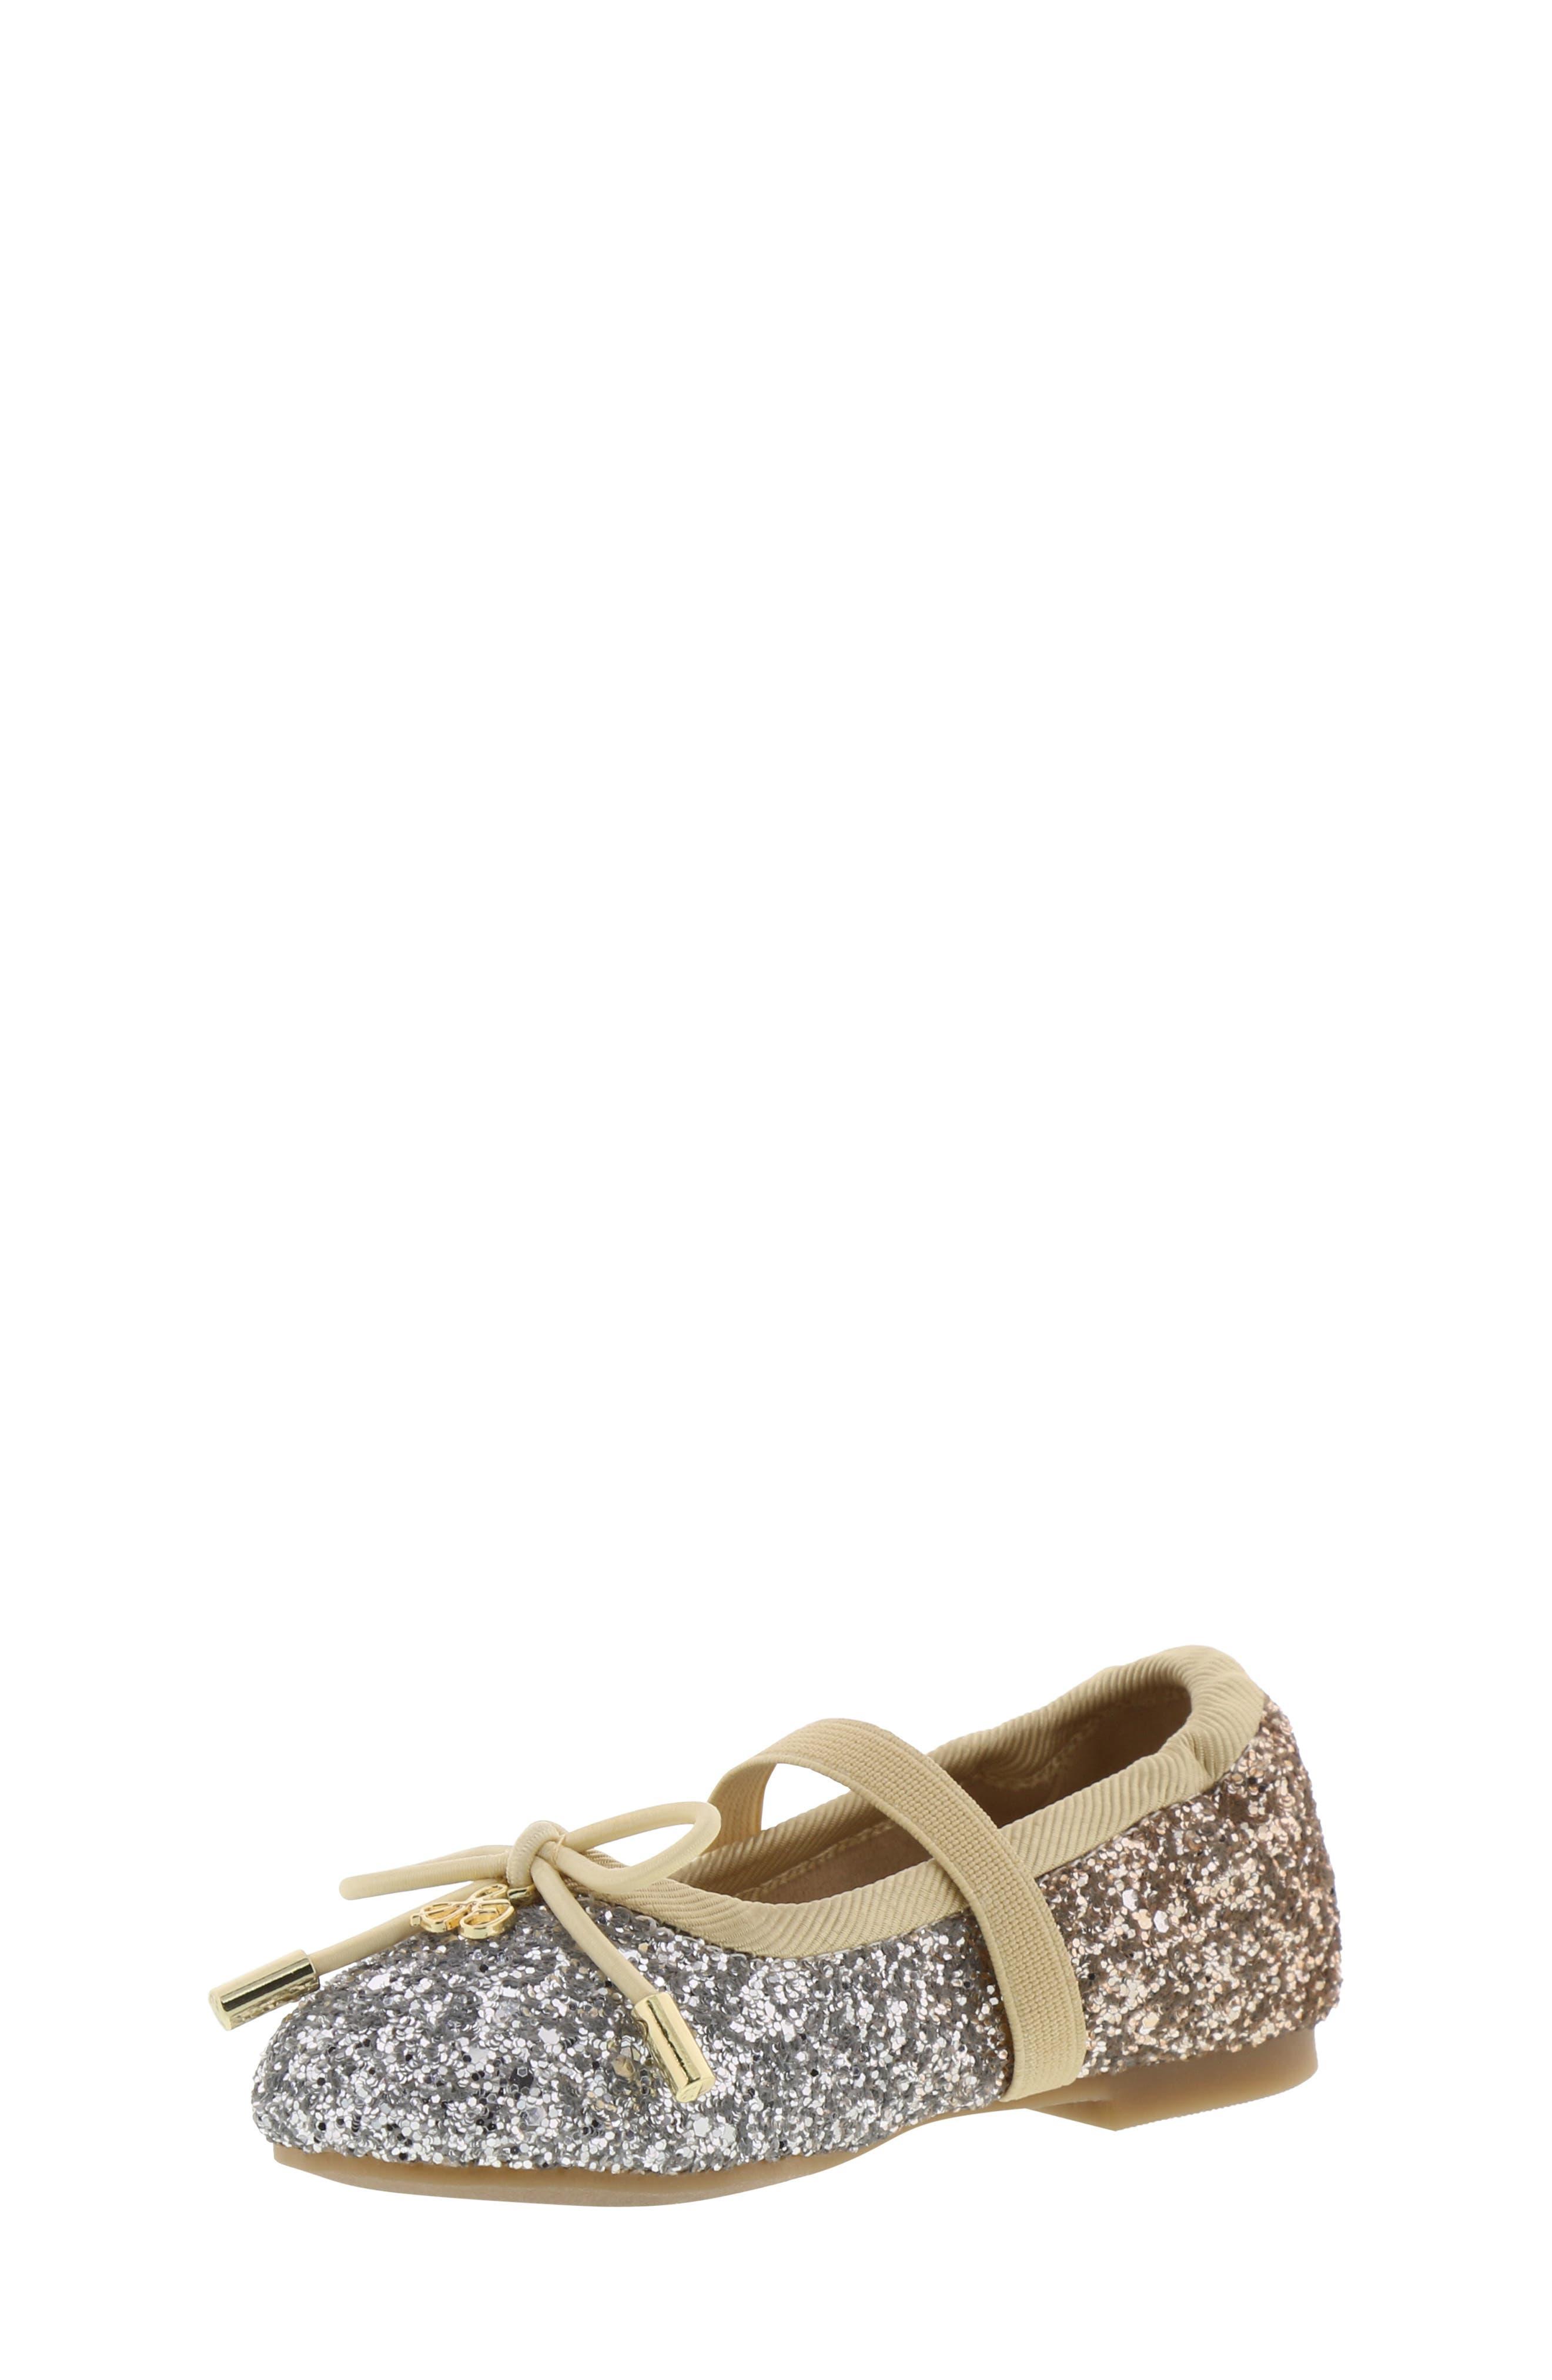 Felicia Ombré Glitter Ballet Flat,                             Main thumbnail 1, color,                             SILVER GOLD